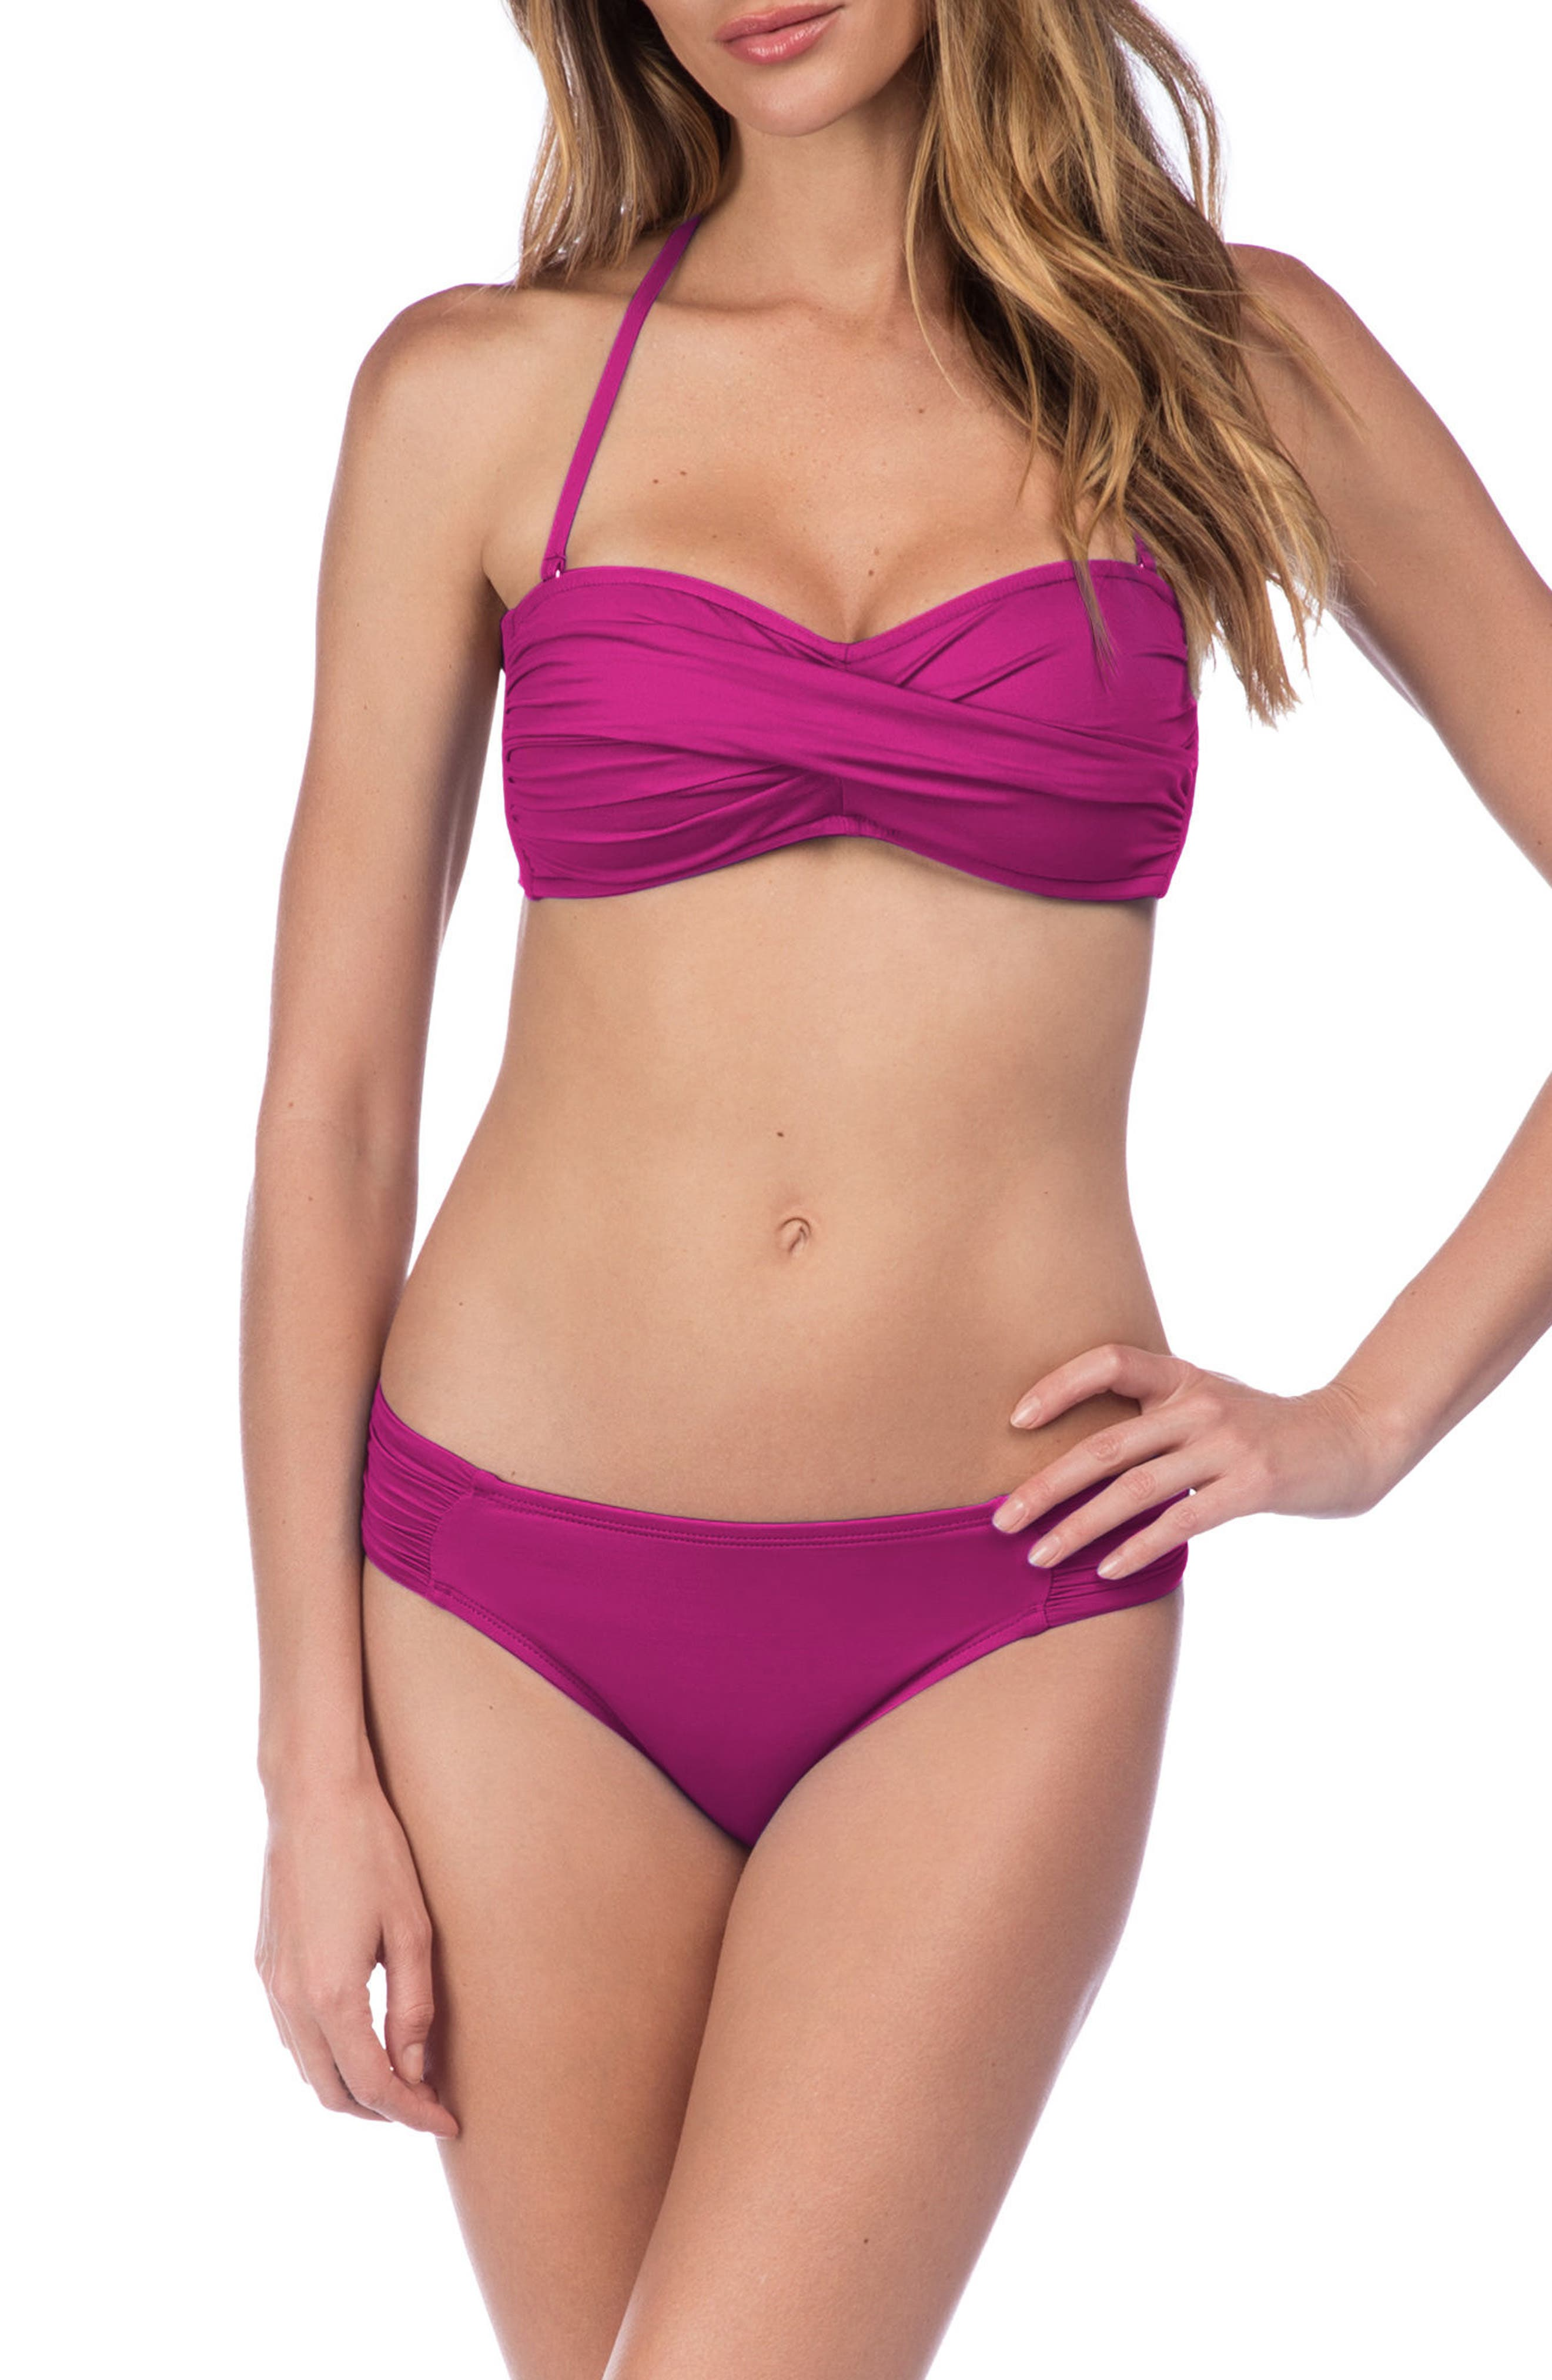 La Blanca 'Island Goddess' Soft Cup Bikini Top